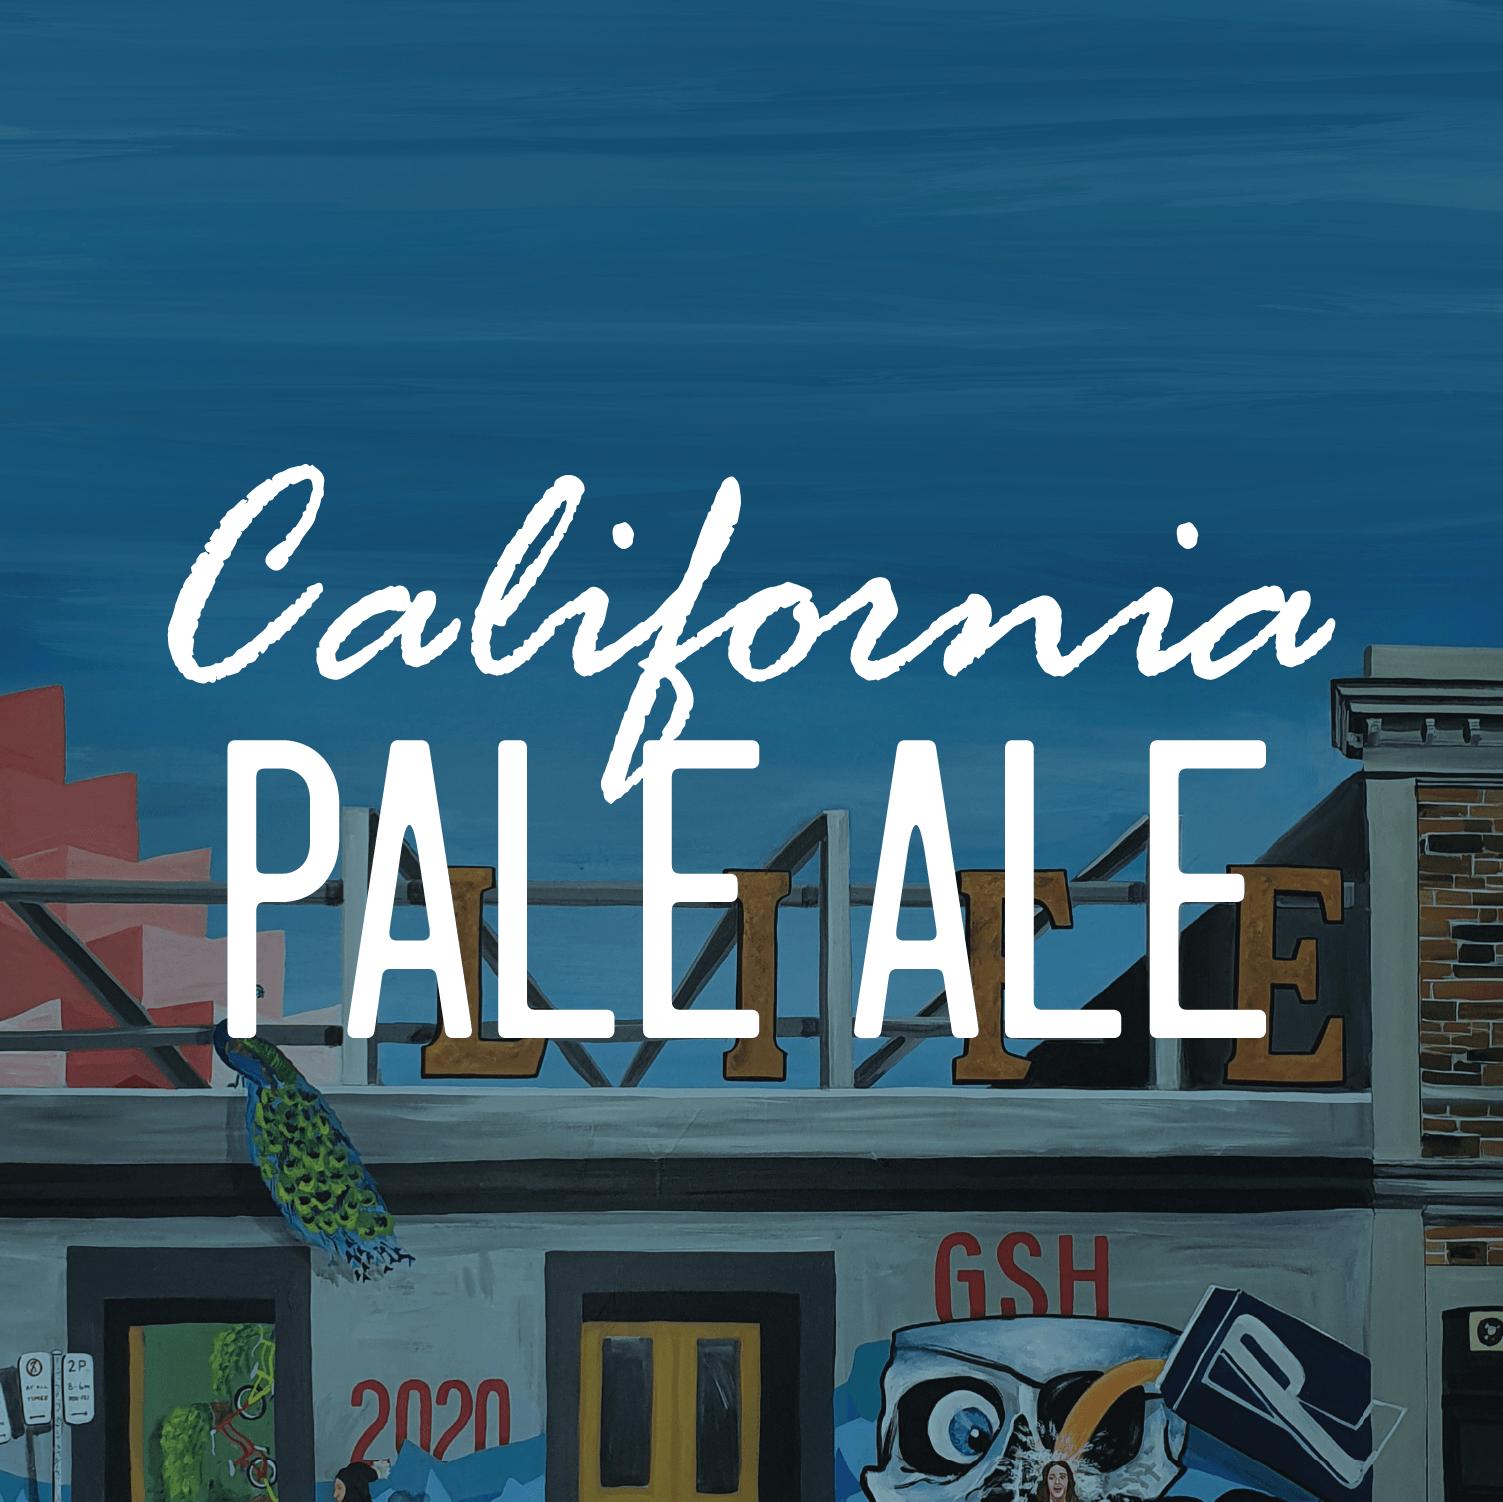 California Pale Ale Pirate Life